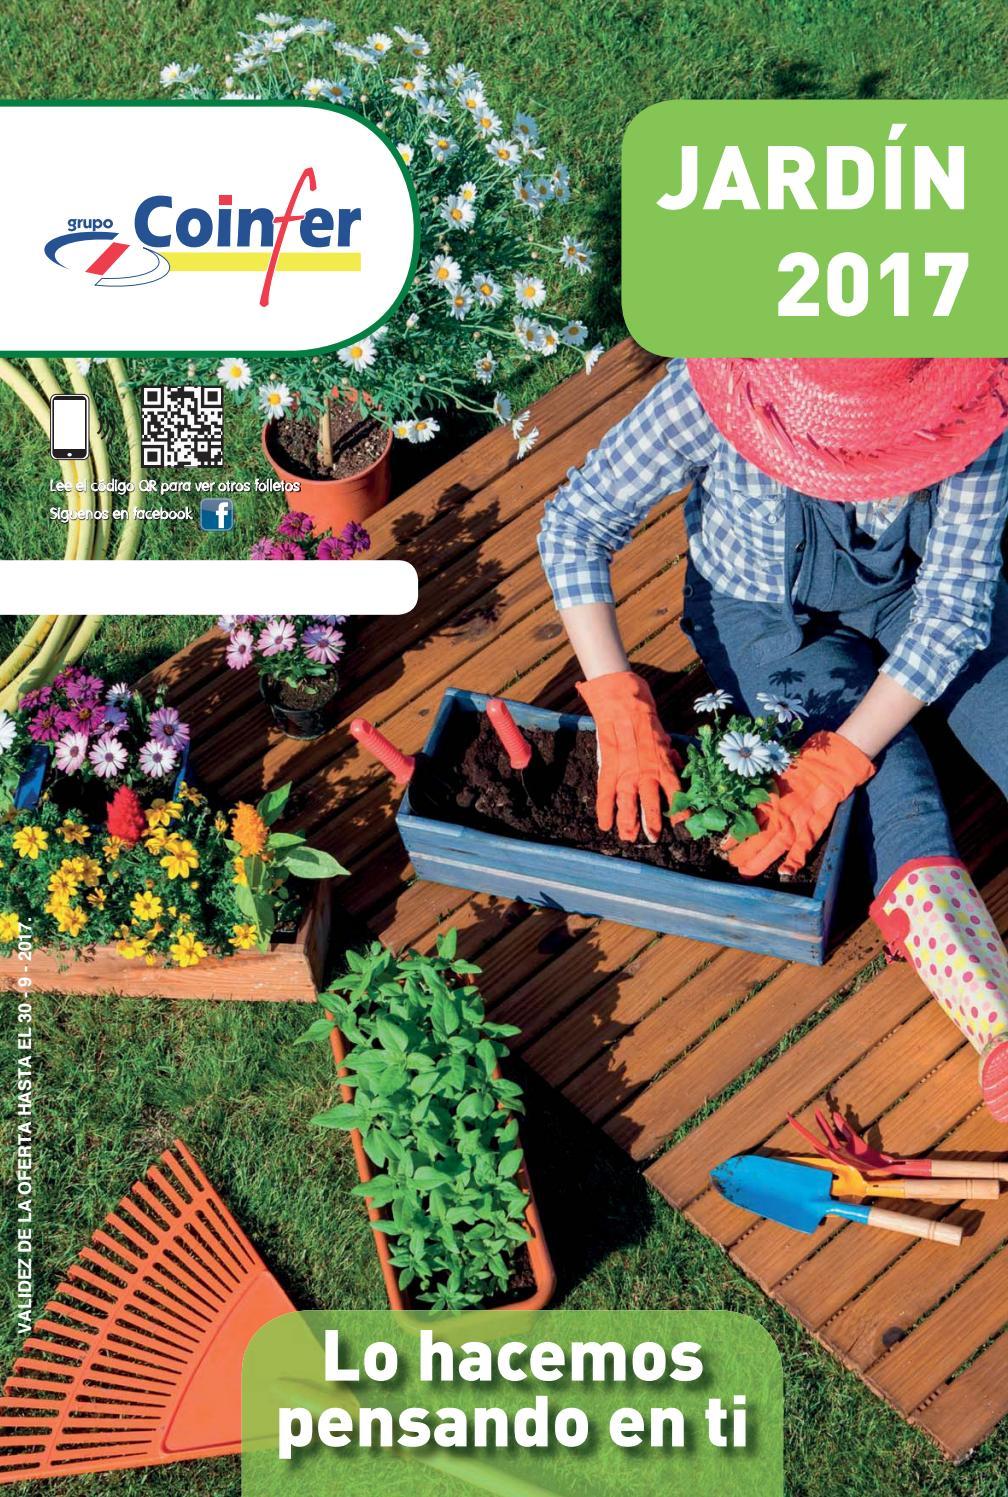 Catálogo de oferta Jardín 2017 Jaype by elkoloqui - issuu